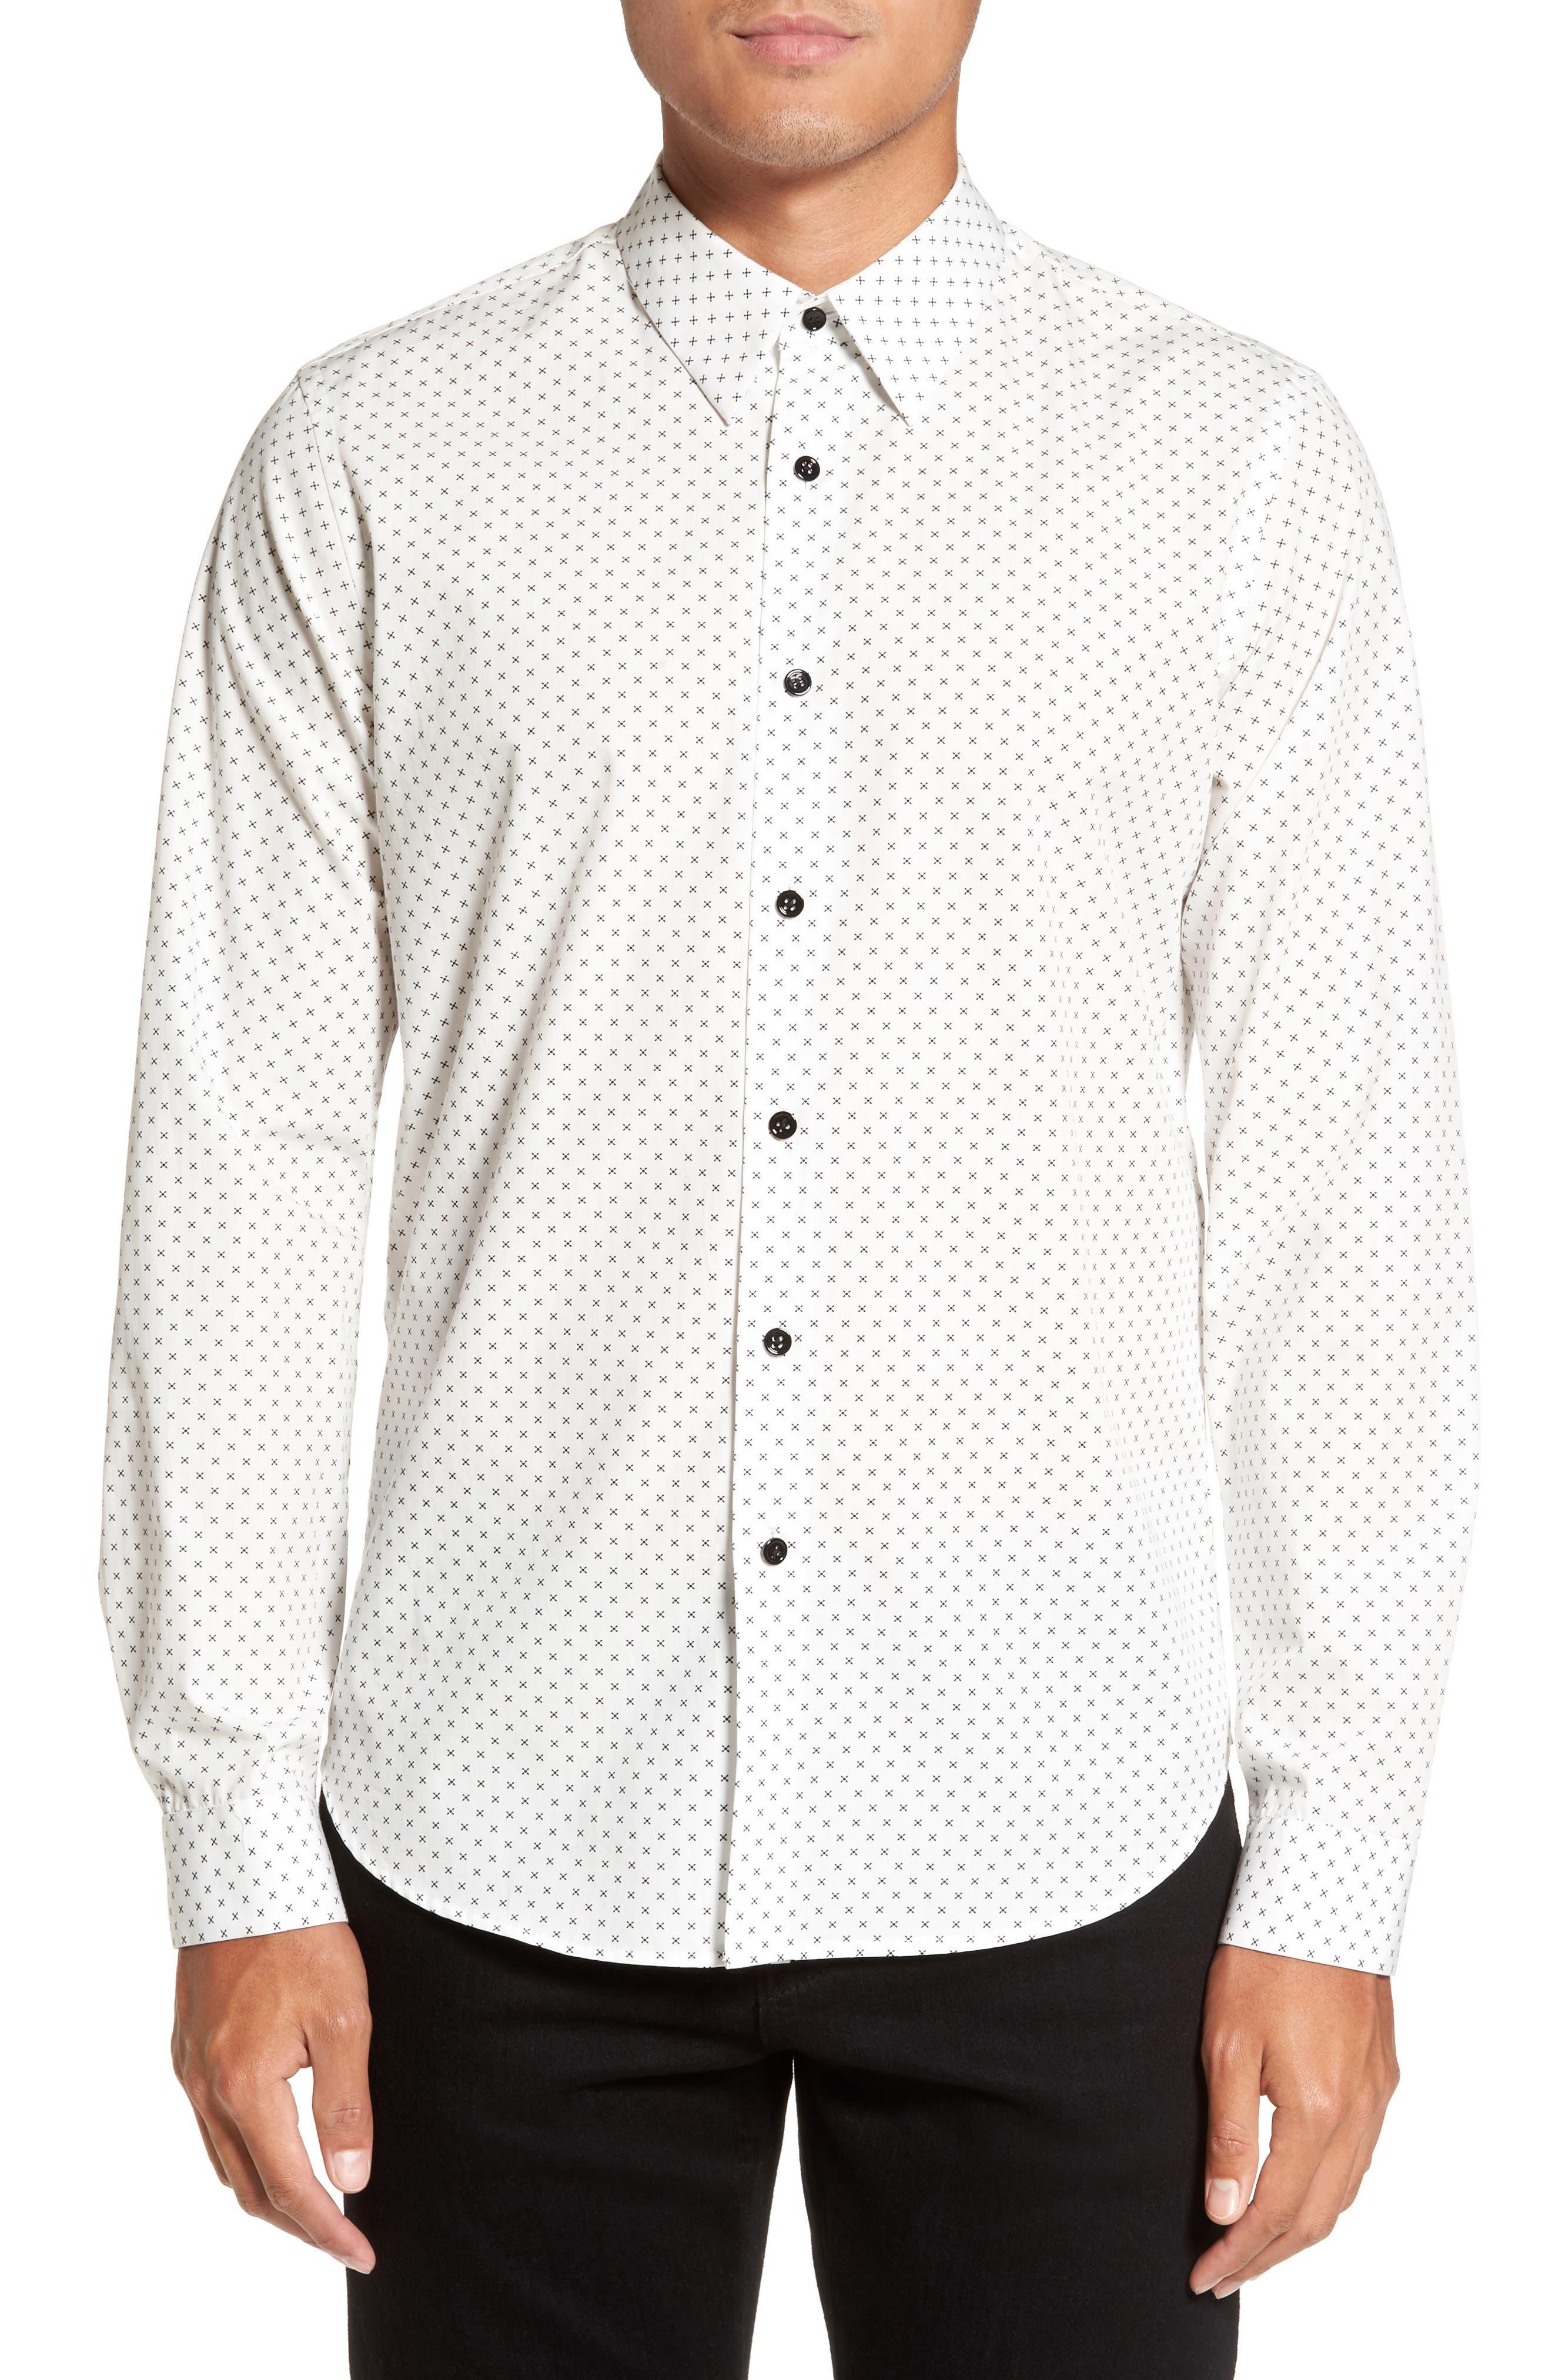 Stitch Print Sport Shirt,                         Main,                         color, Ivory Multi